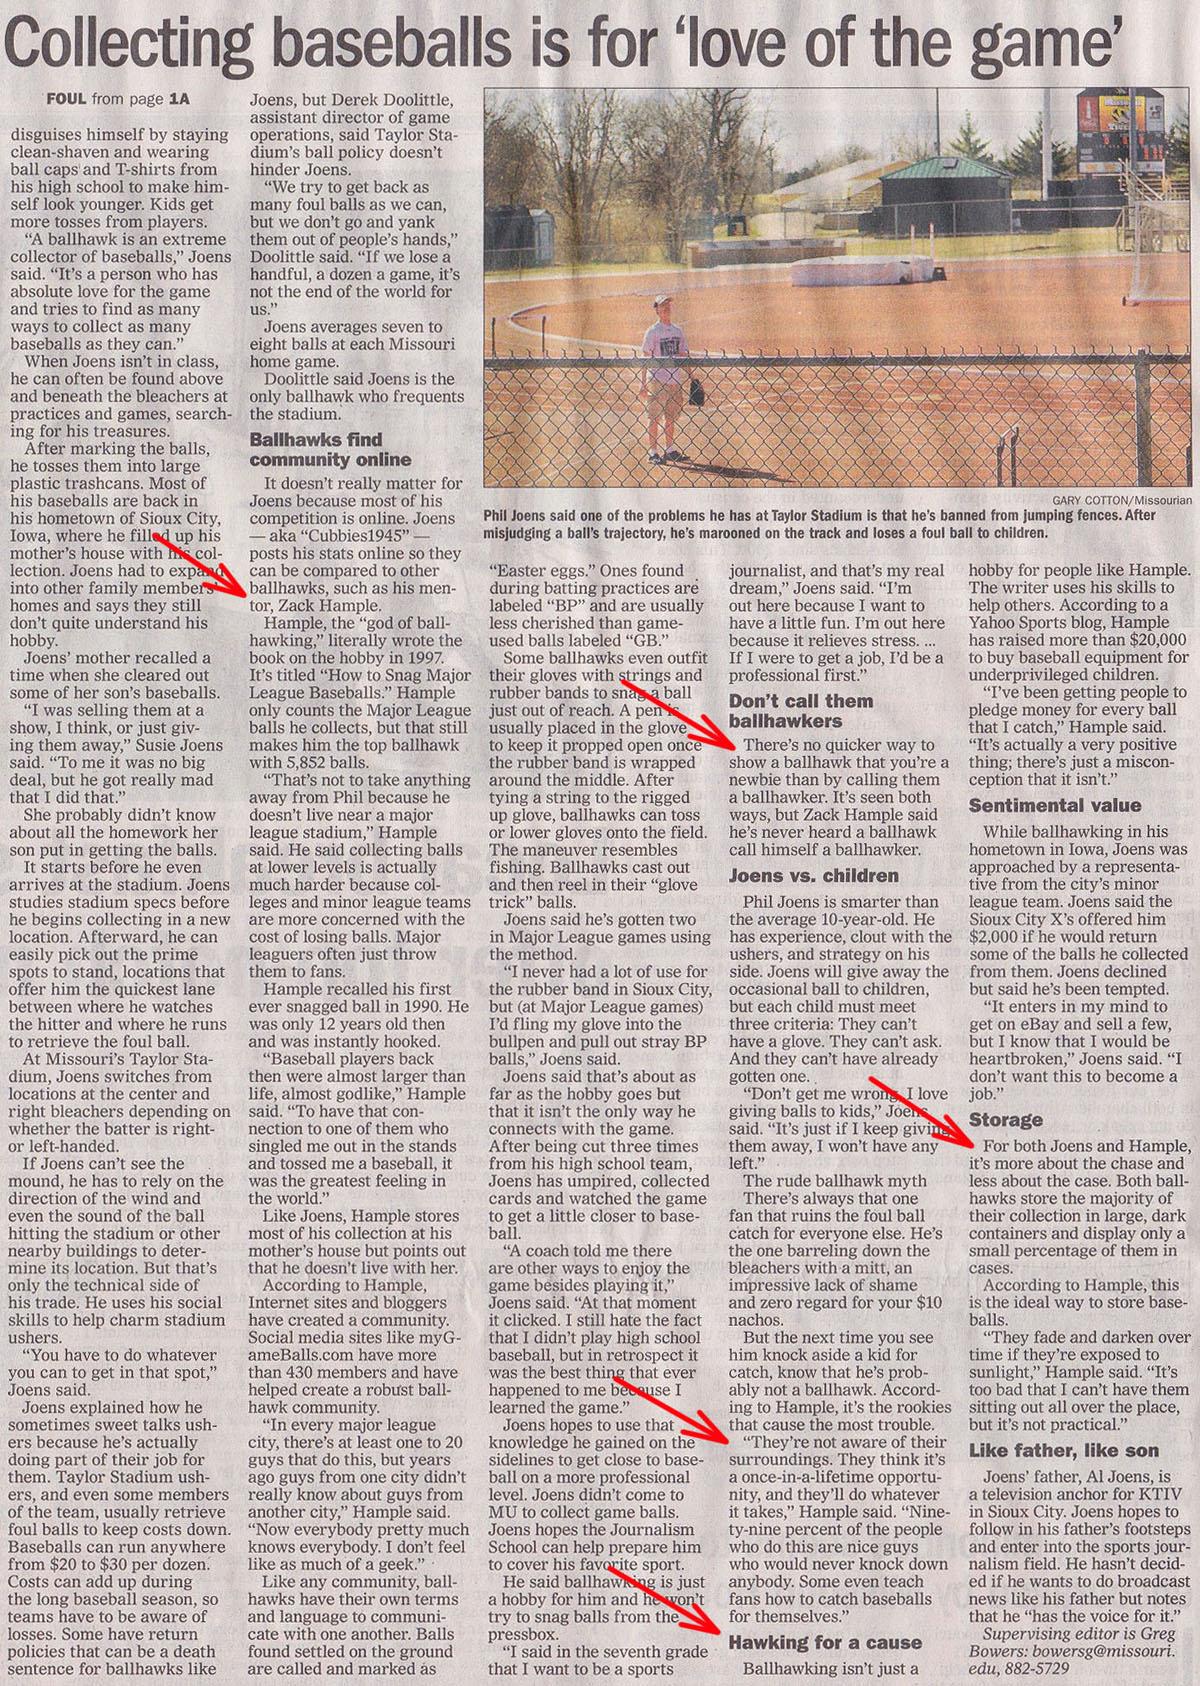 The Missourian April 26 2012 Zack Hample